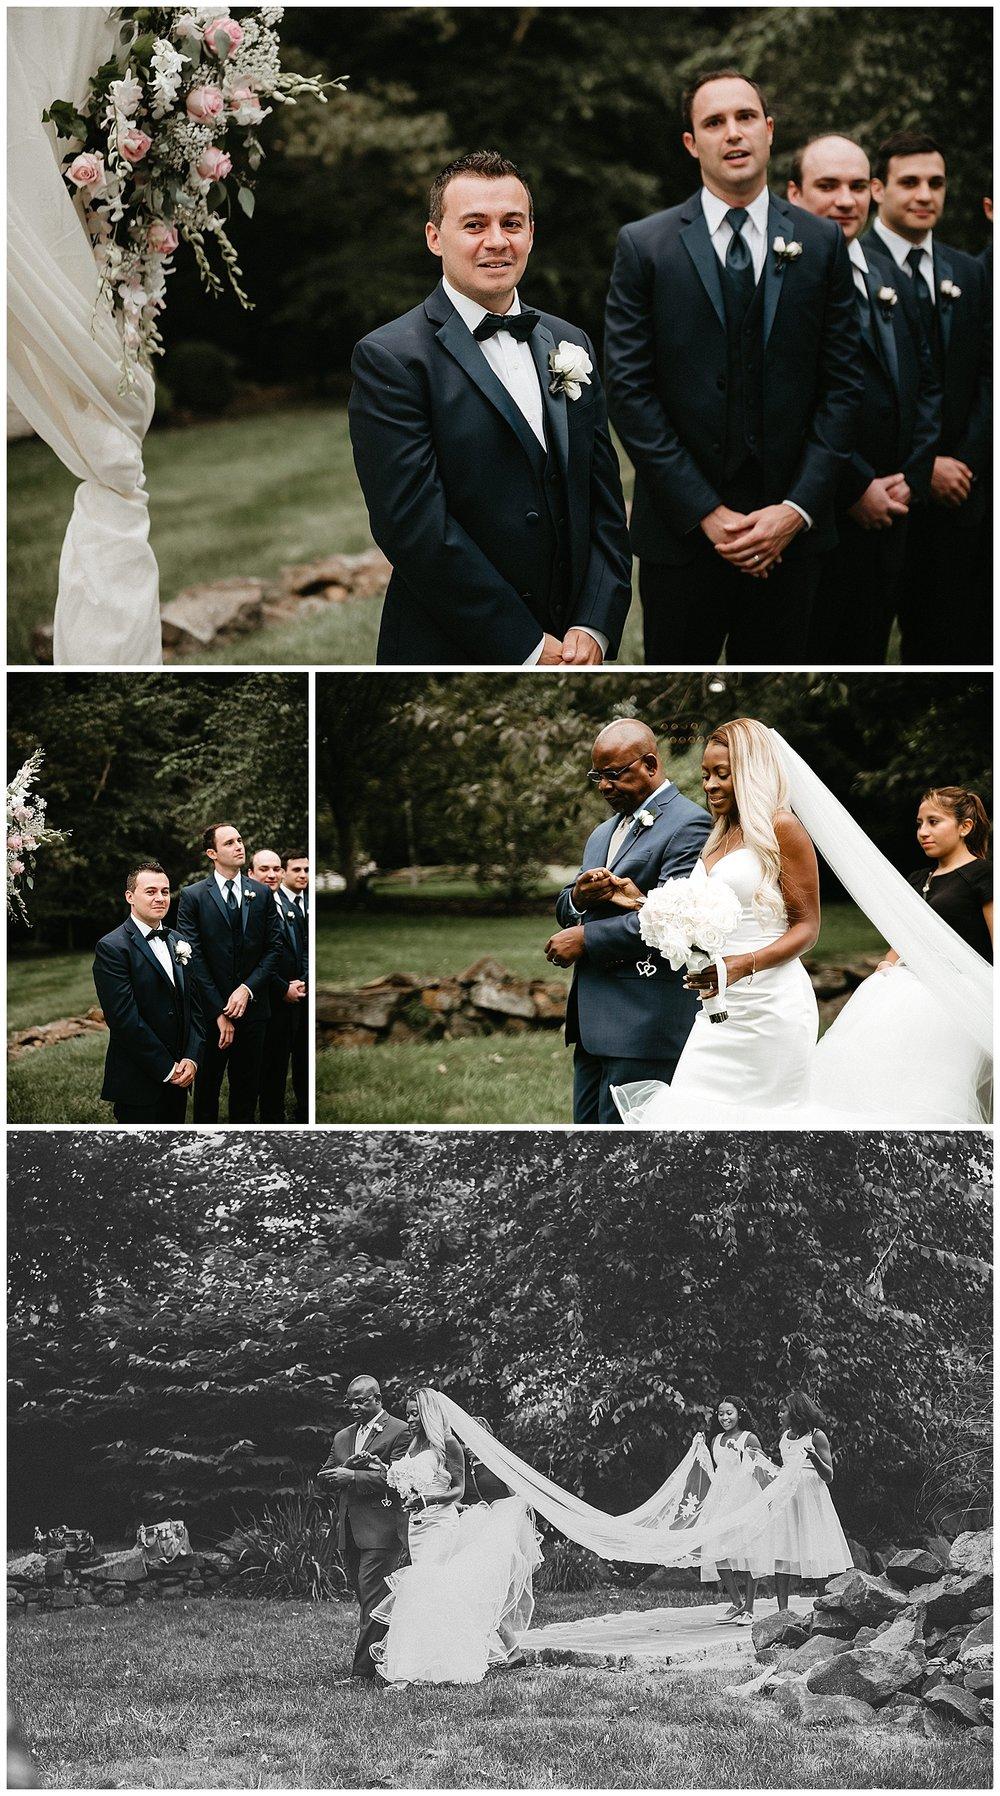 New-Jersey-wedding-photographer-at-Stone-House-at-stirling-ridge-Warren-NJ_0043.jpg